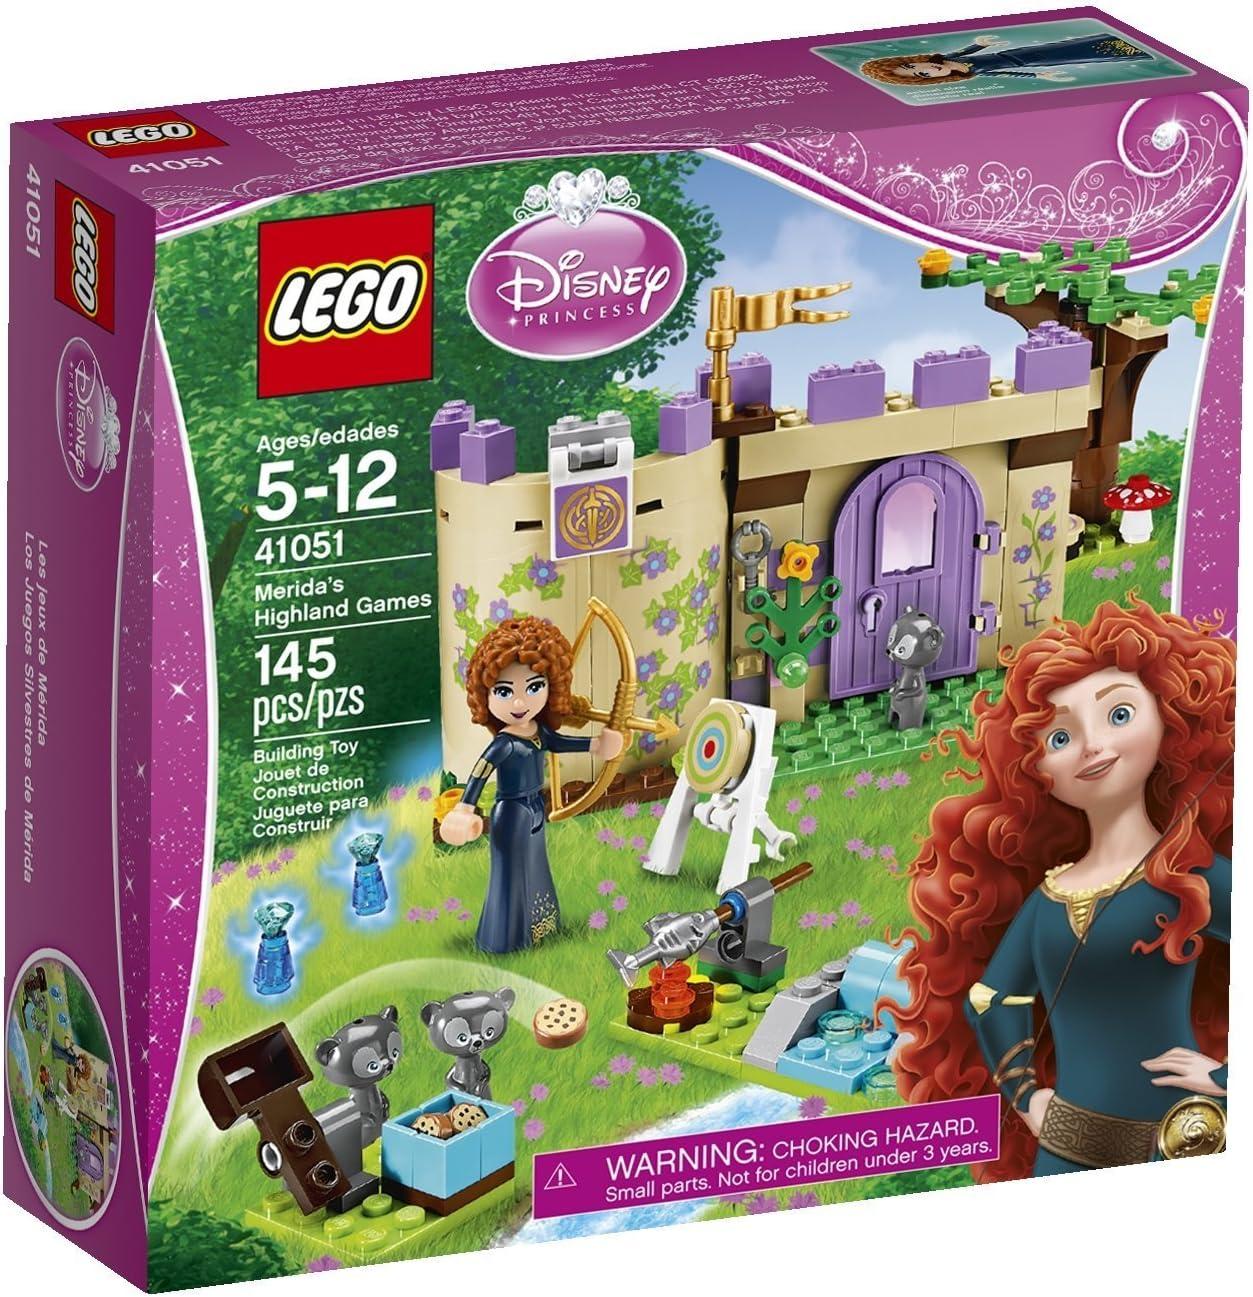 LEGO Disney Toys Premium Princess Merida Castle Set with Minifigures for 6 Year Olds Children